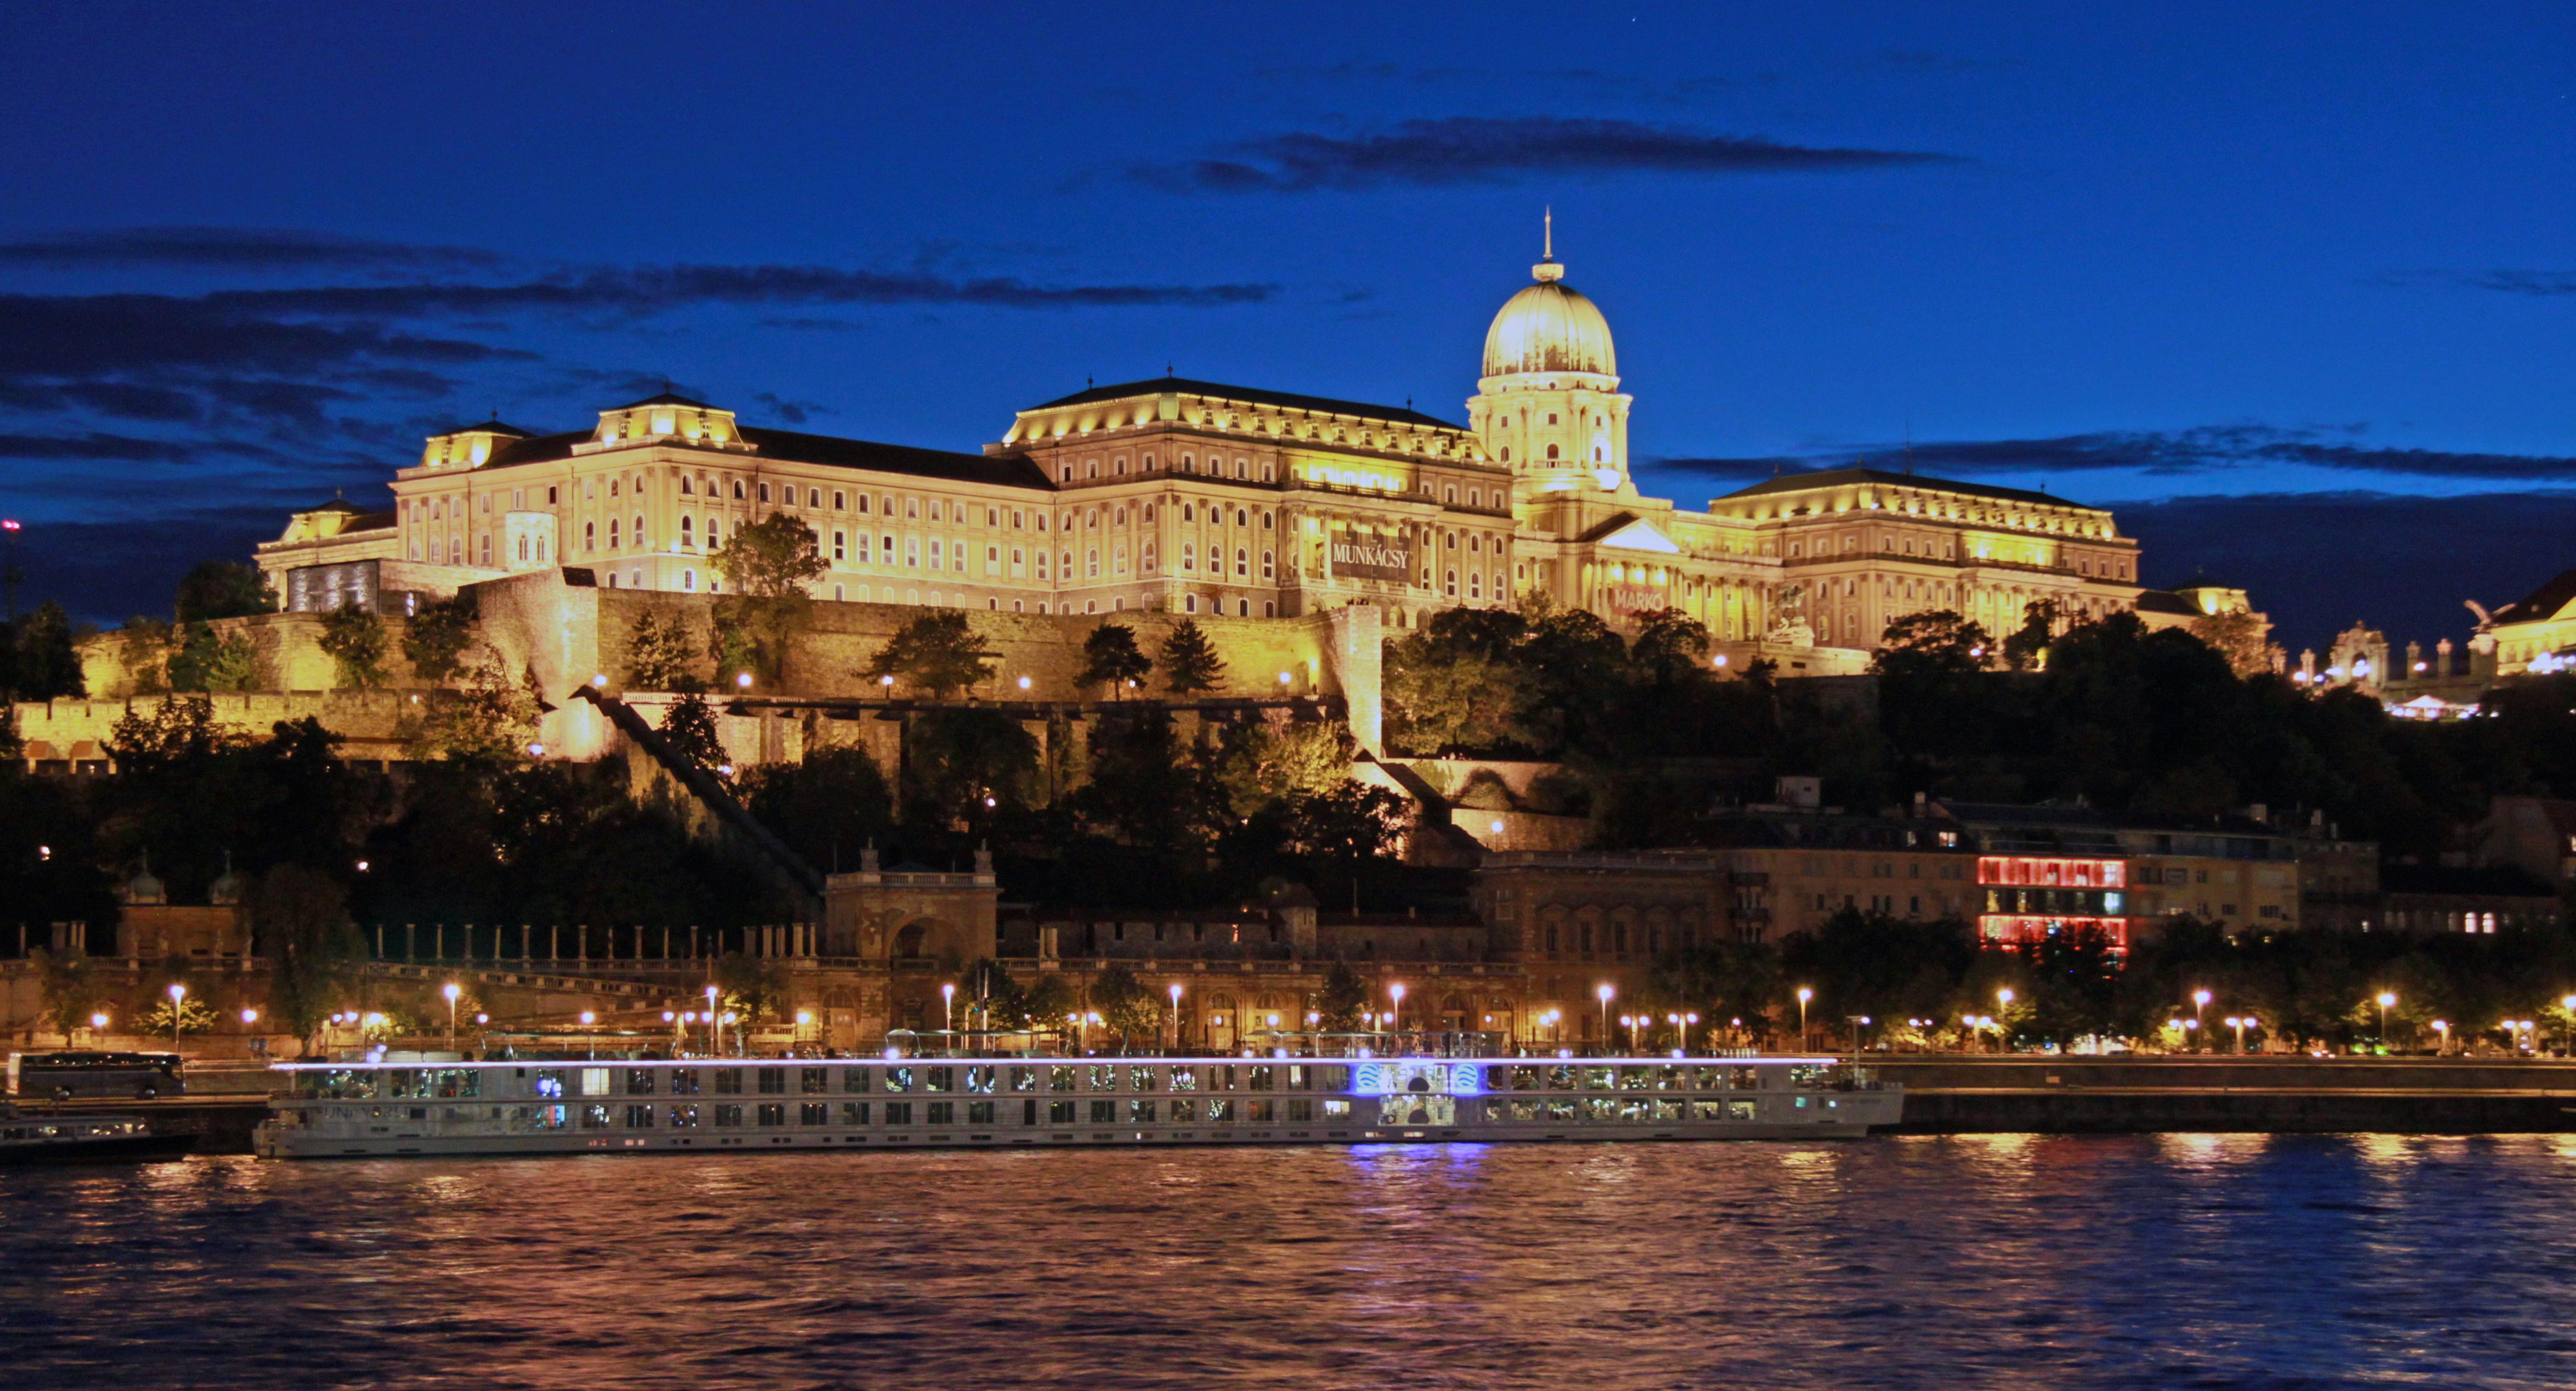 「budapest castle」的圖片搜尋結果